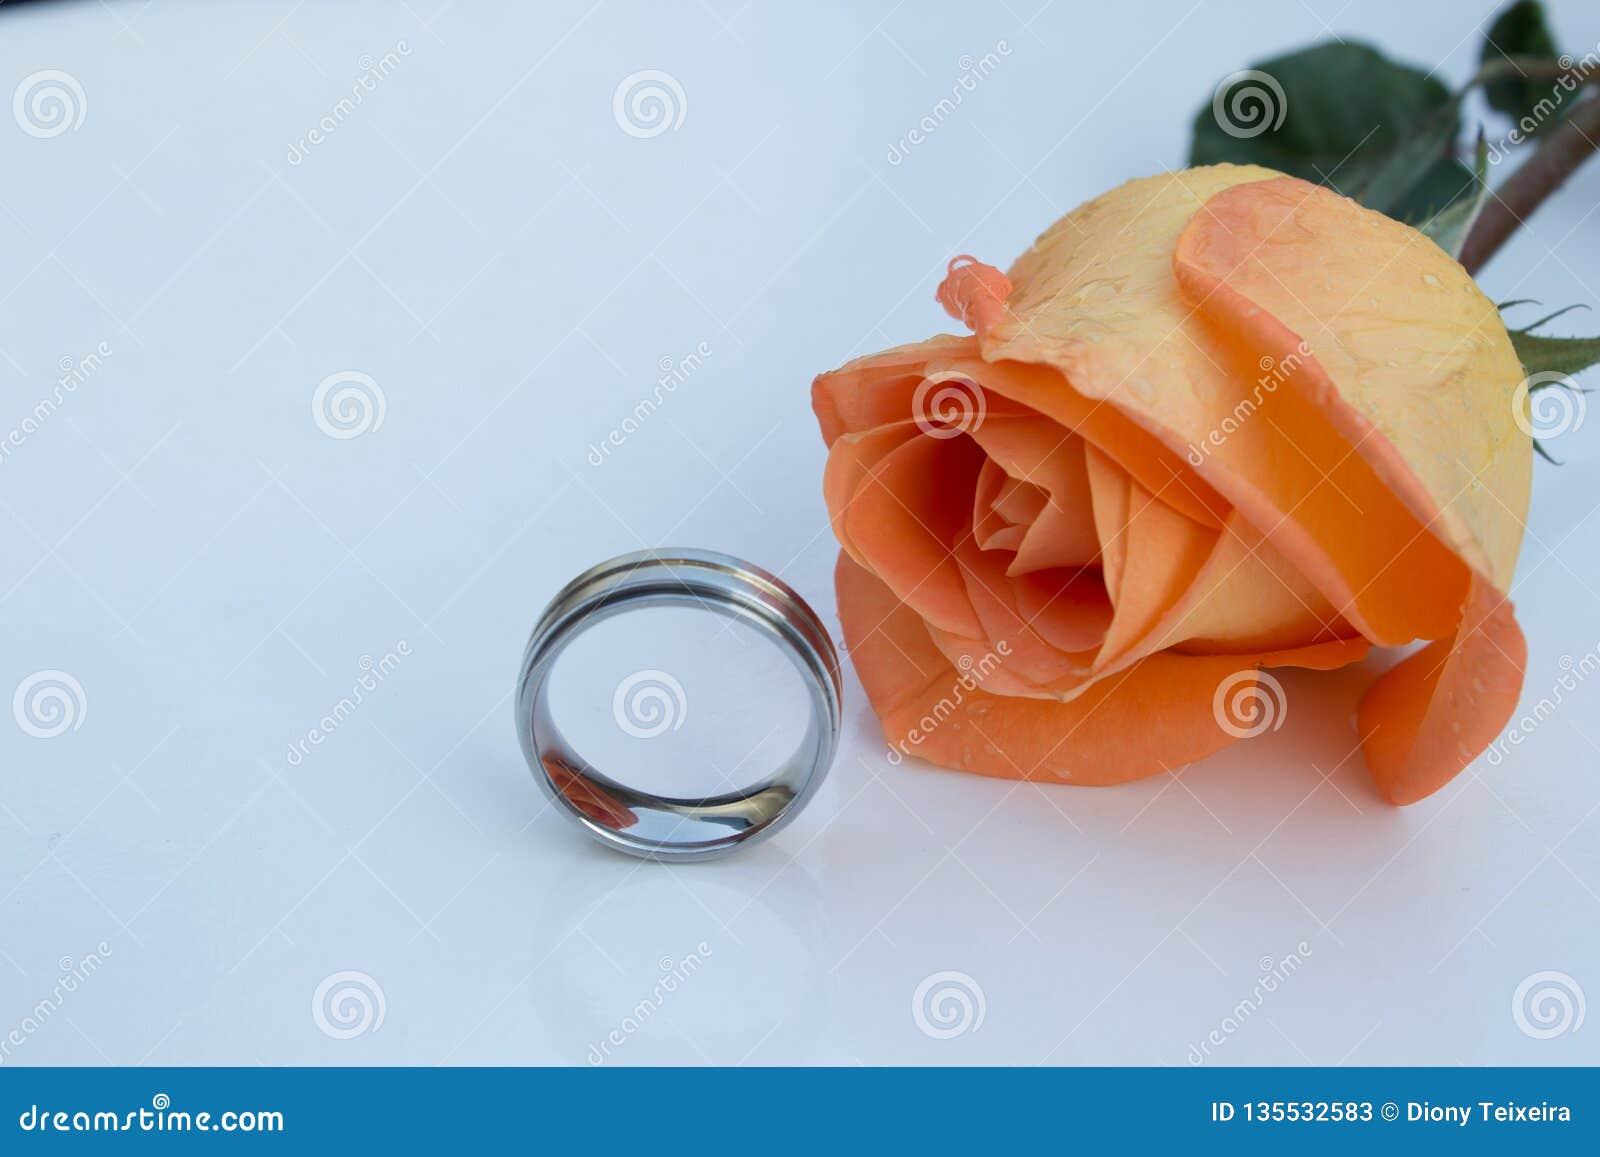 Wedding ring chromed and orange rose, on white background